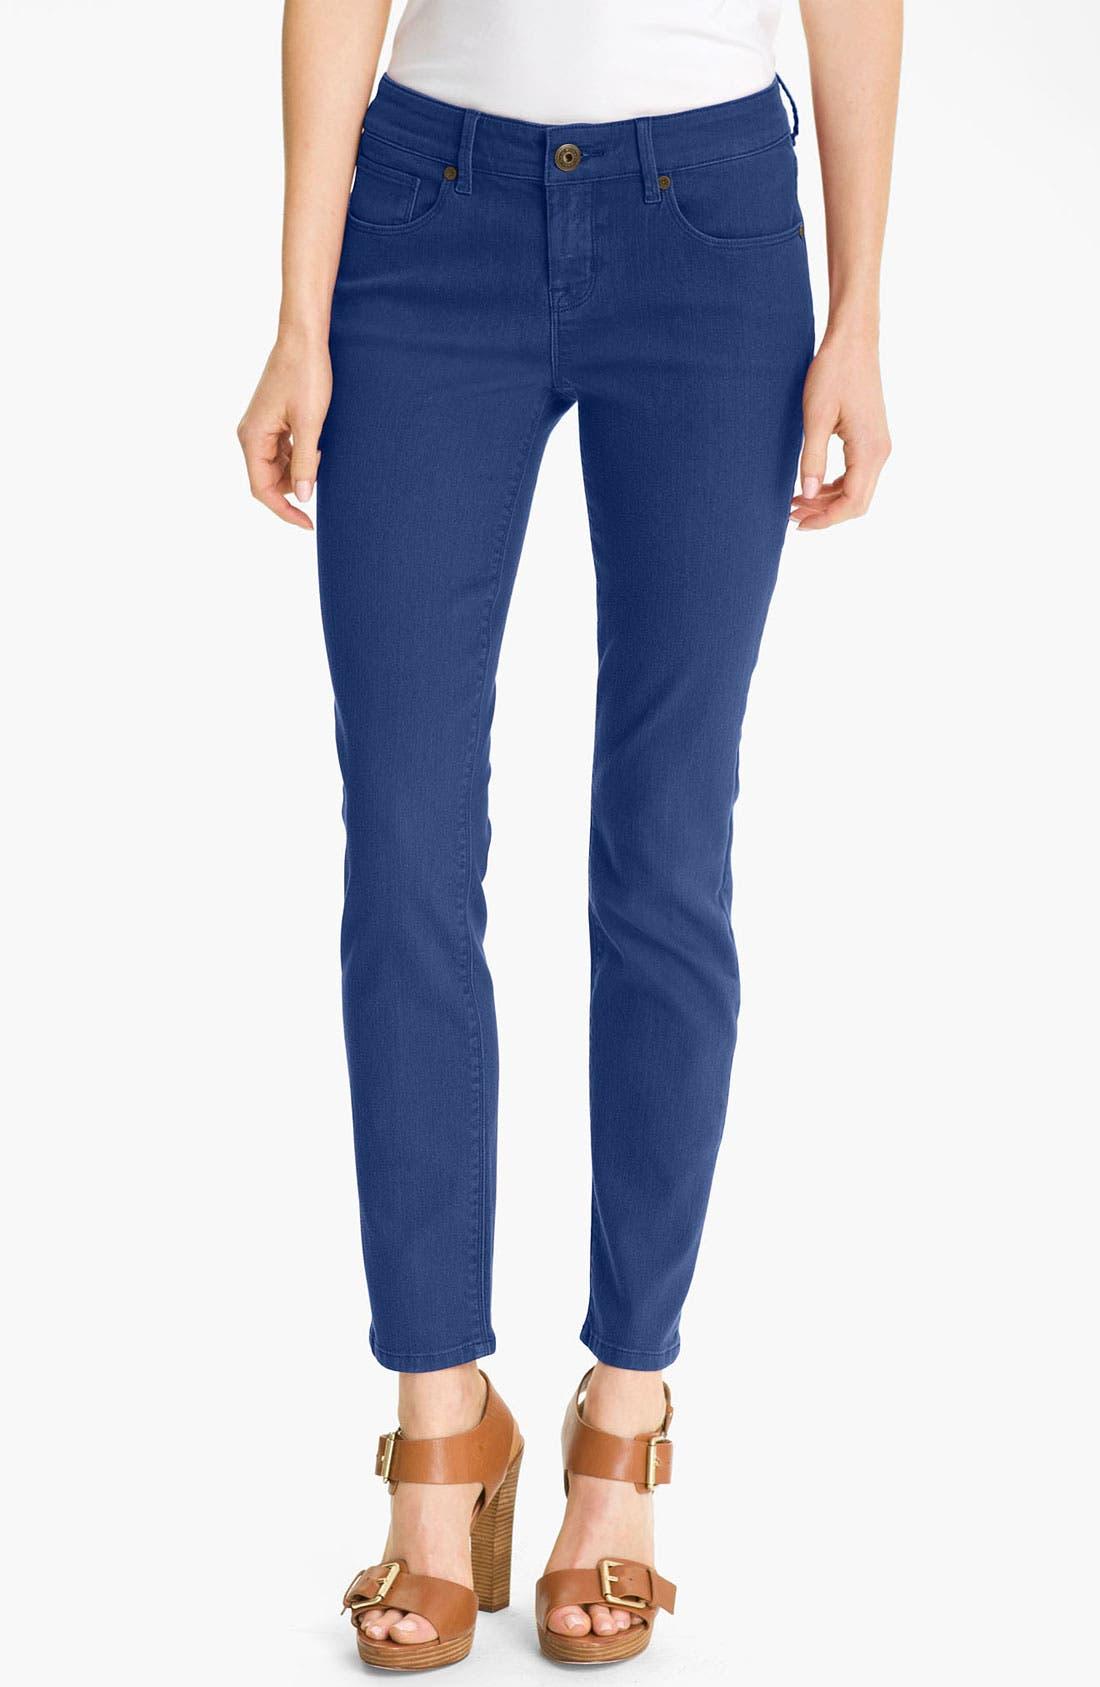 Alternate Image 1 Selected - Isaac Mizrahi Jeans 'Samantha' Colored Denim Skinny Jeans